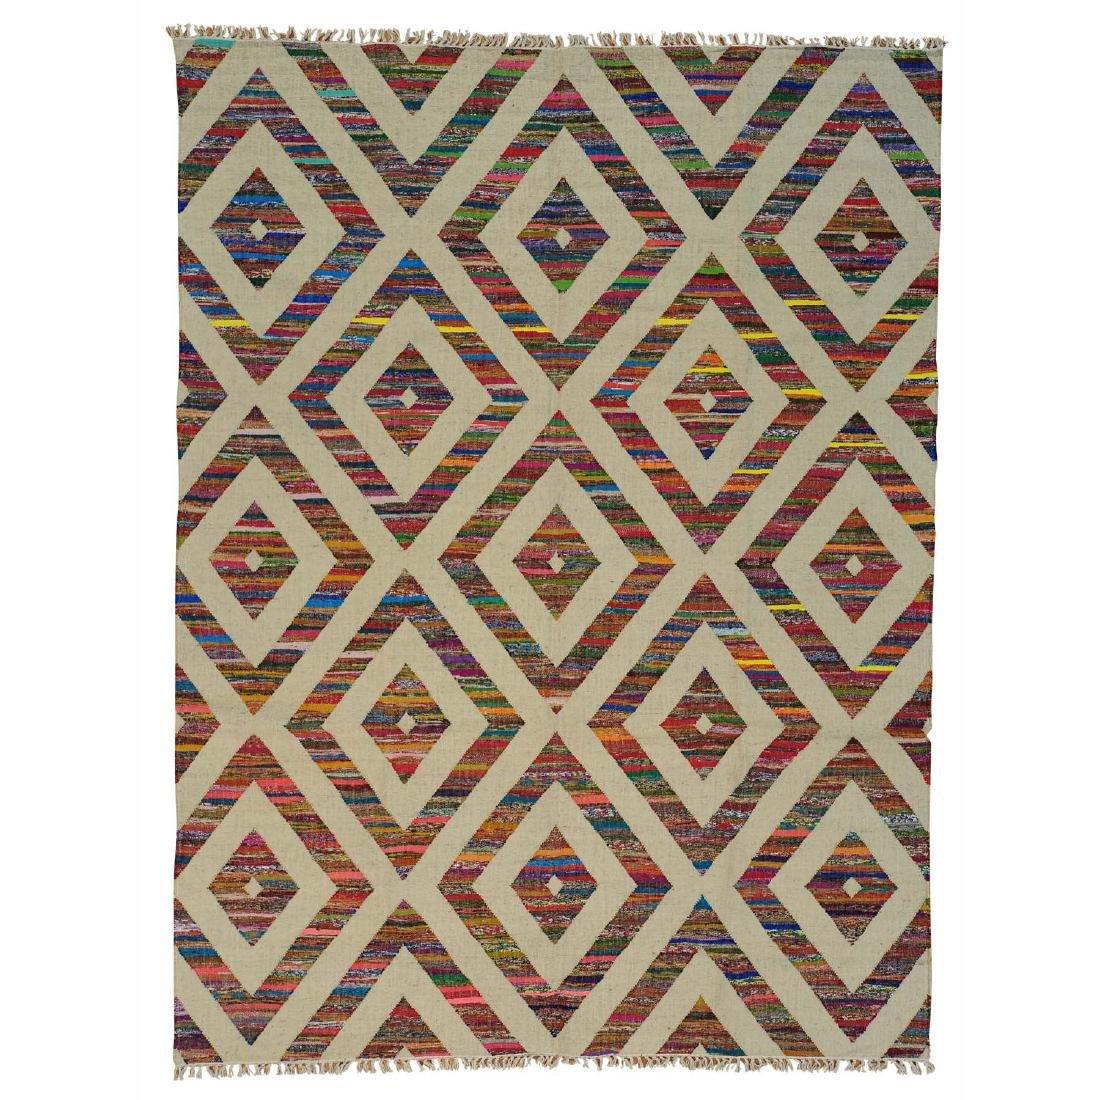 Weave Hand Woven Wool Sari Silk Durie Kilim Rug 9x11.10